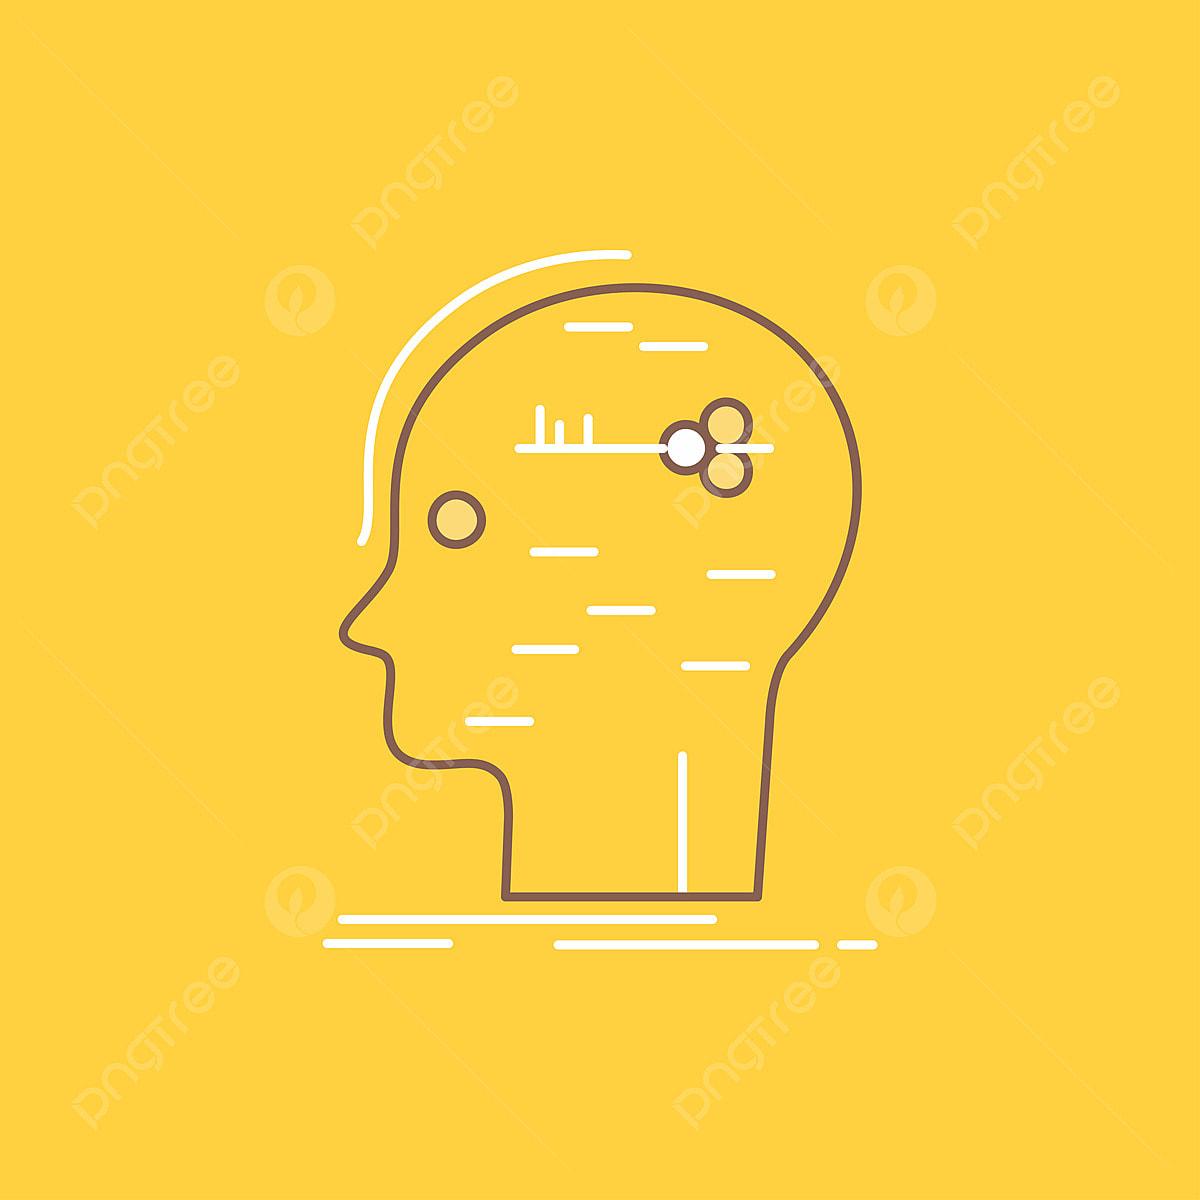 Brain Hack Hacking Key Mind Flat Line Filled Icon Beautiful